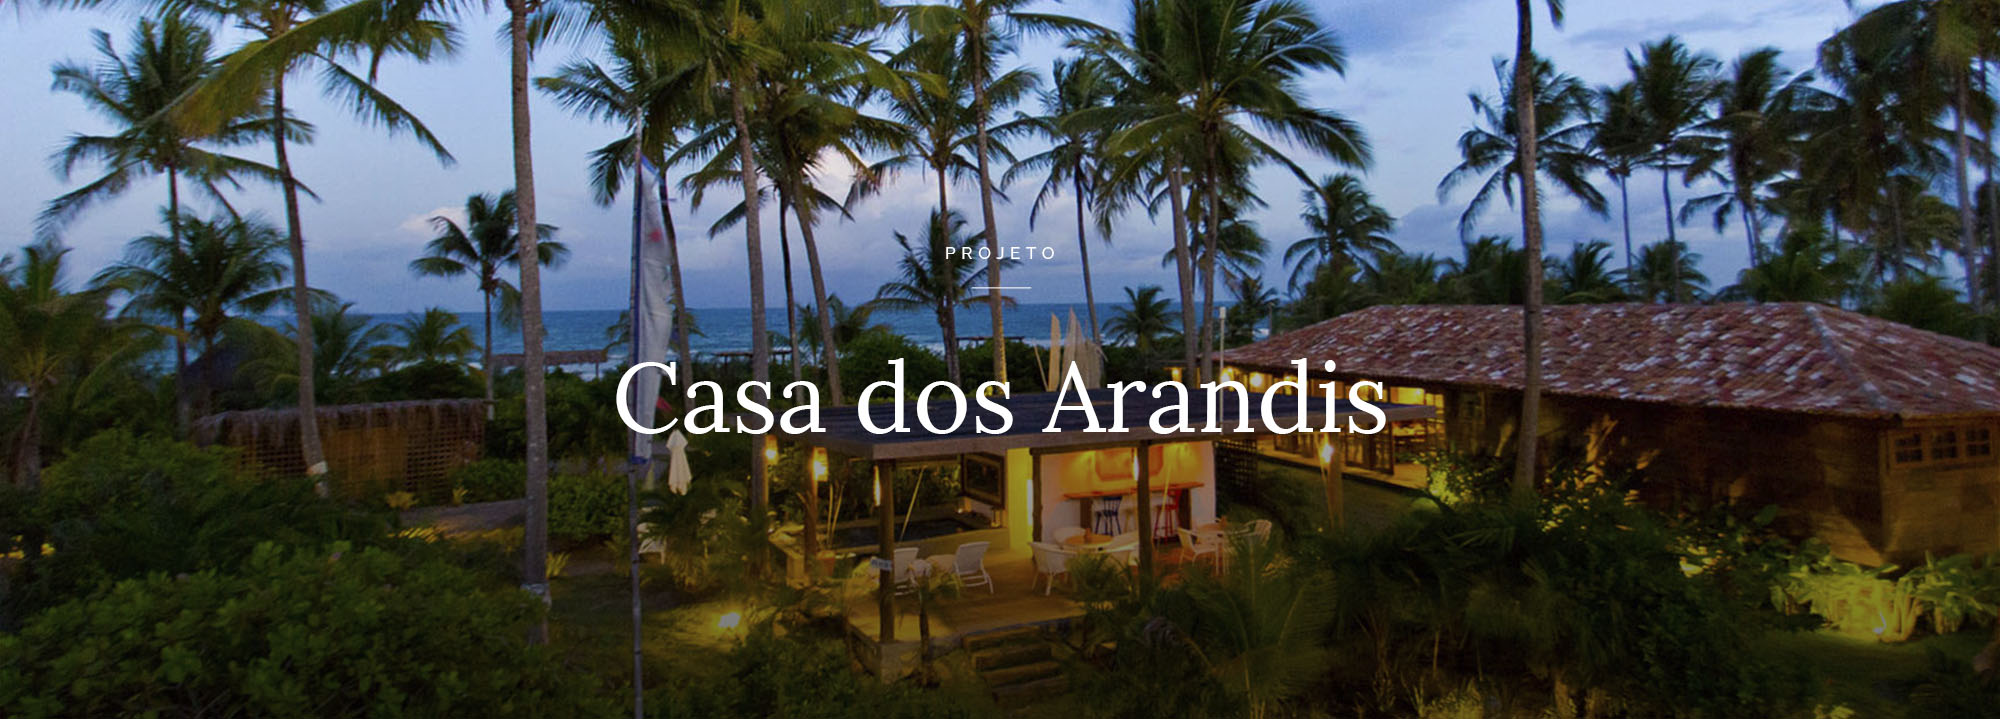 CasadosArandis